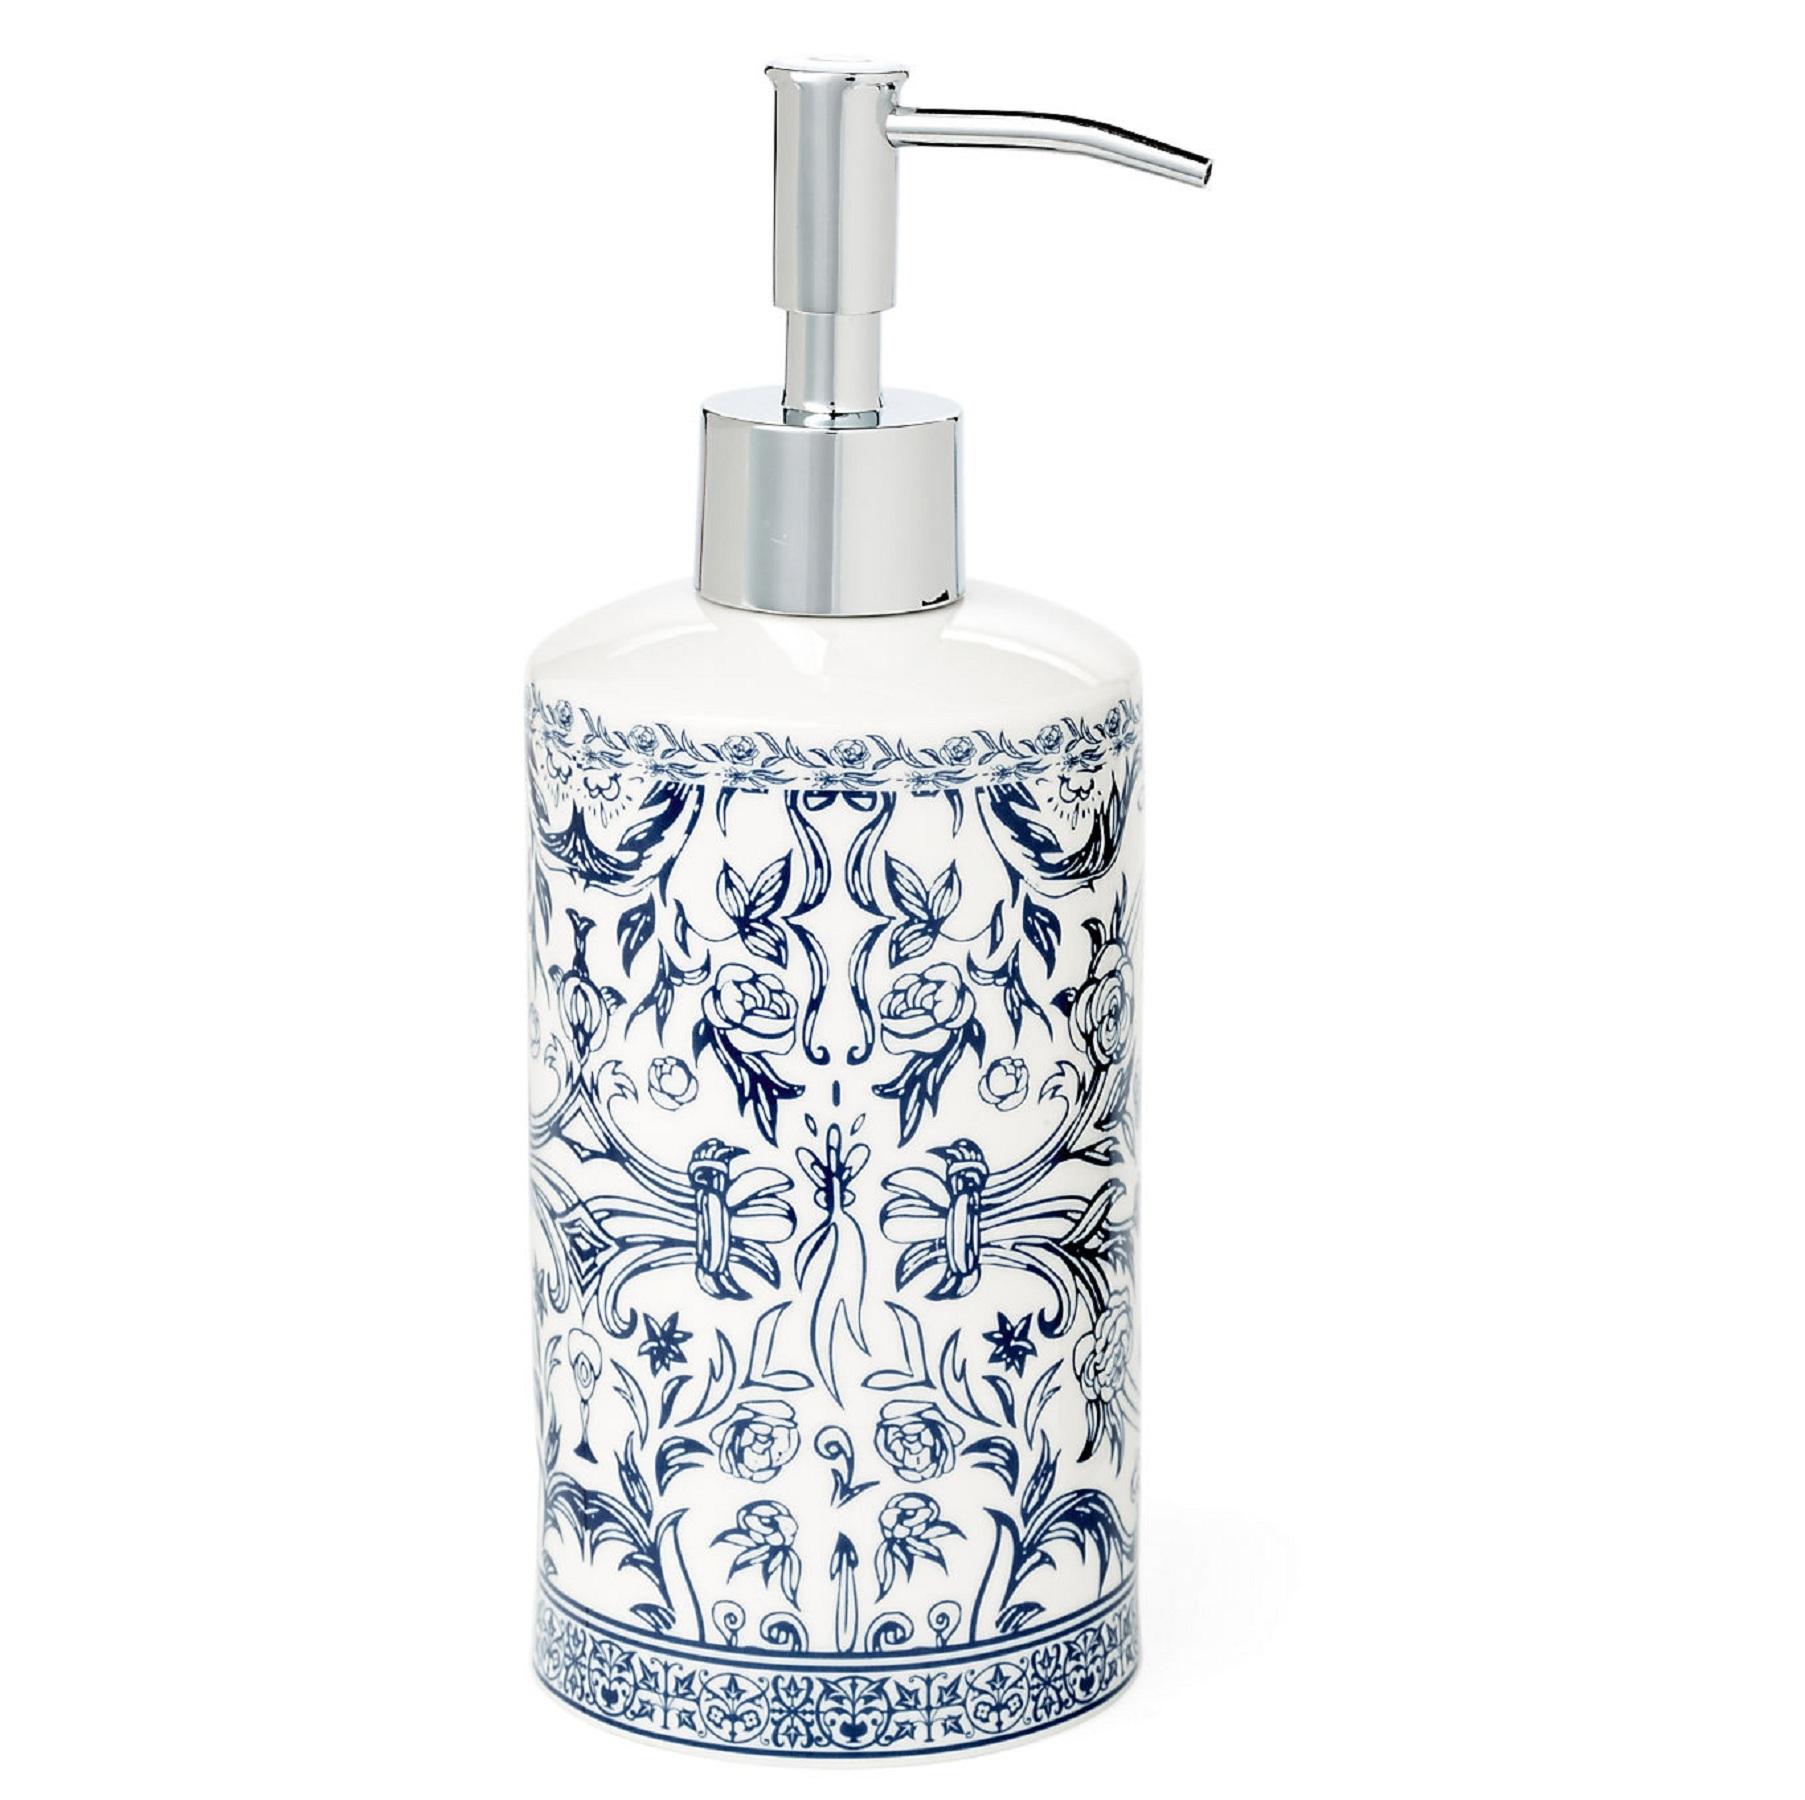 Дозаторы для мыла Дозатор для жидкого мыла Kassatex Orsay Blue dozator-dlya-zhidkogo-mila-orsay-blue-ot-kassatex-ssha-kitay.jpg